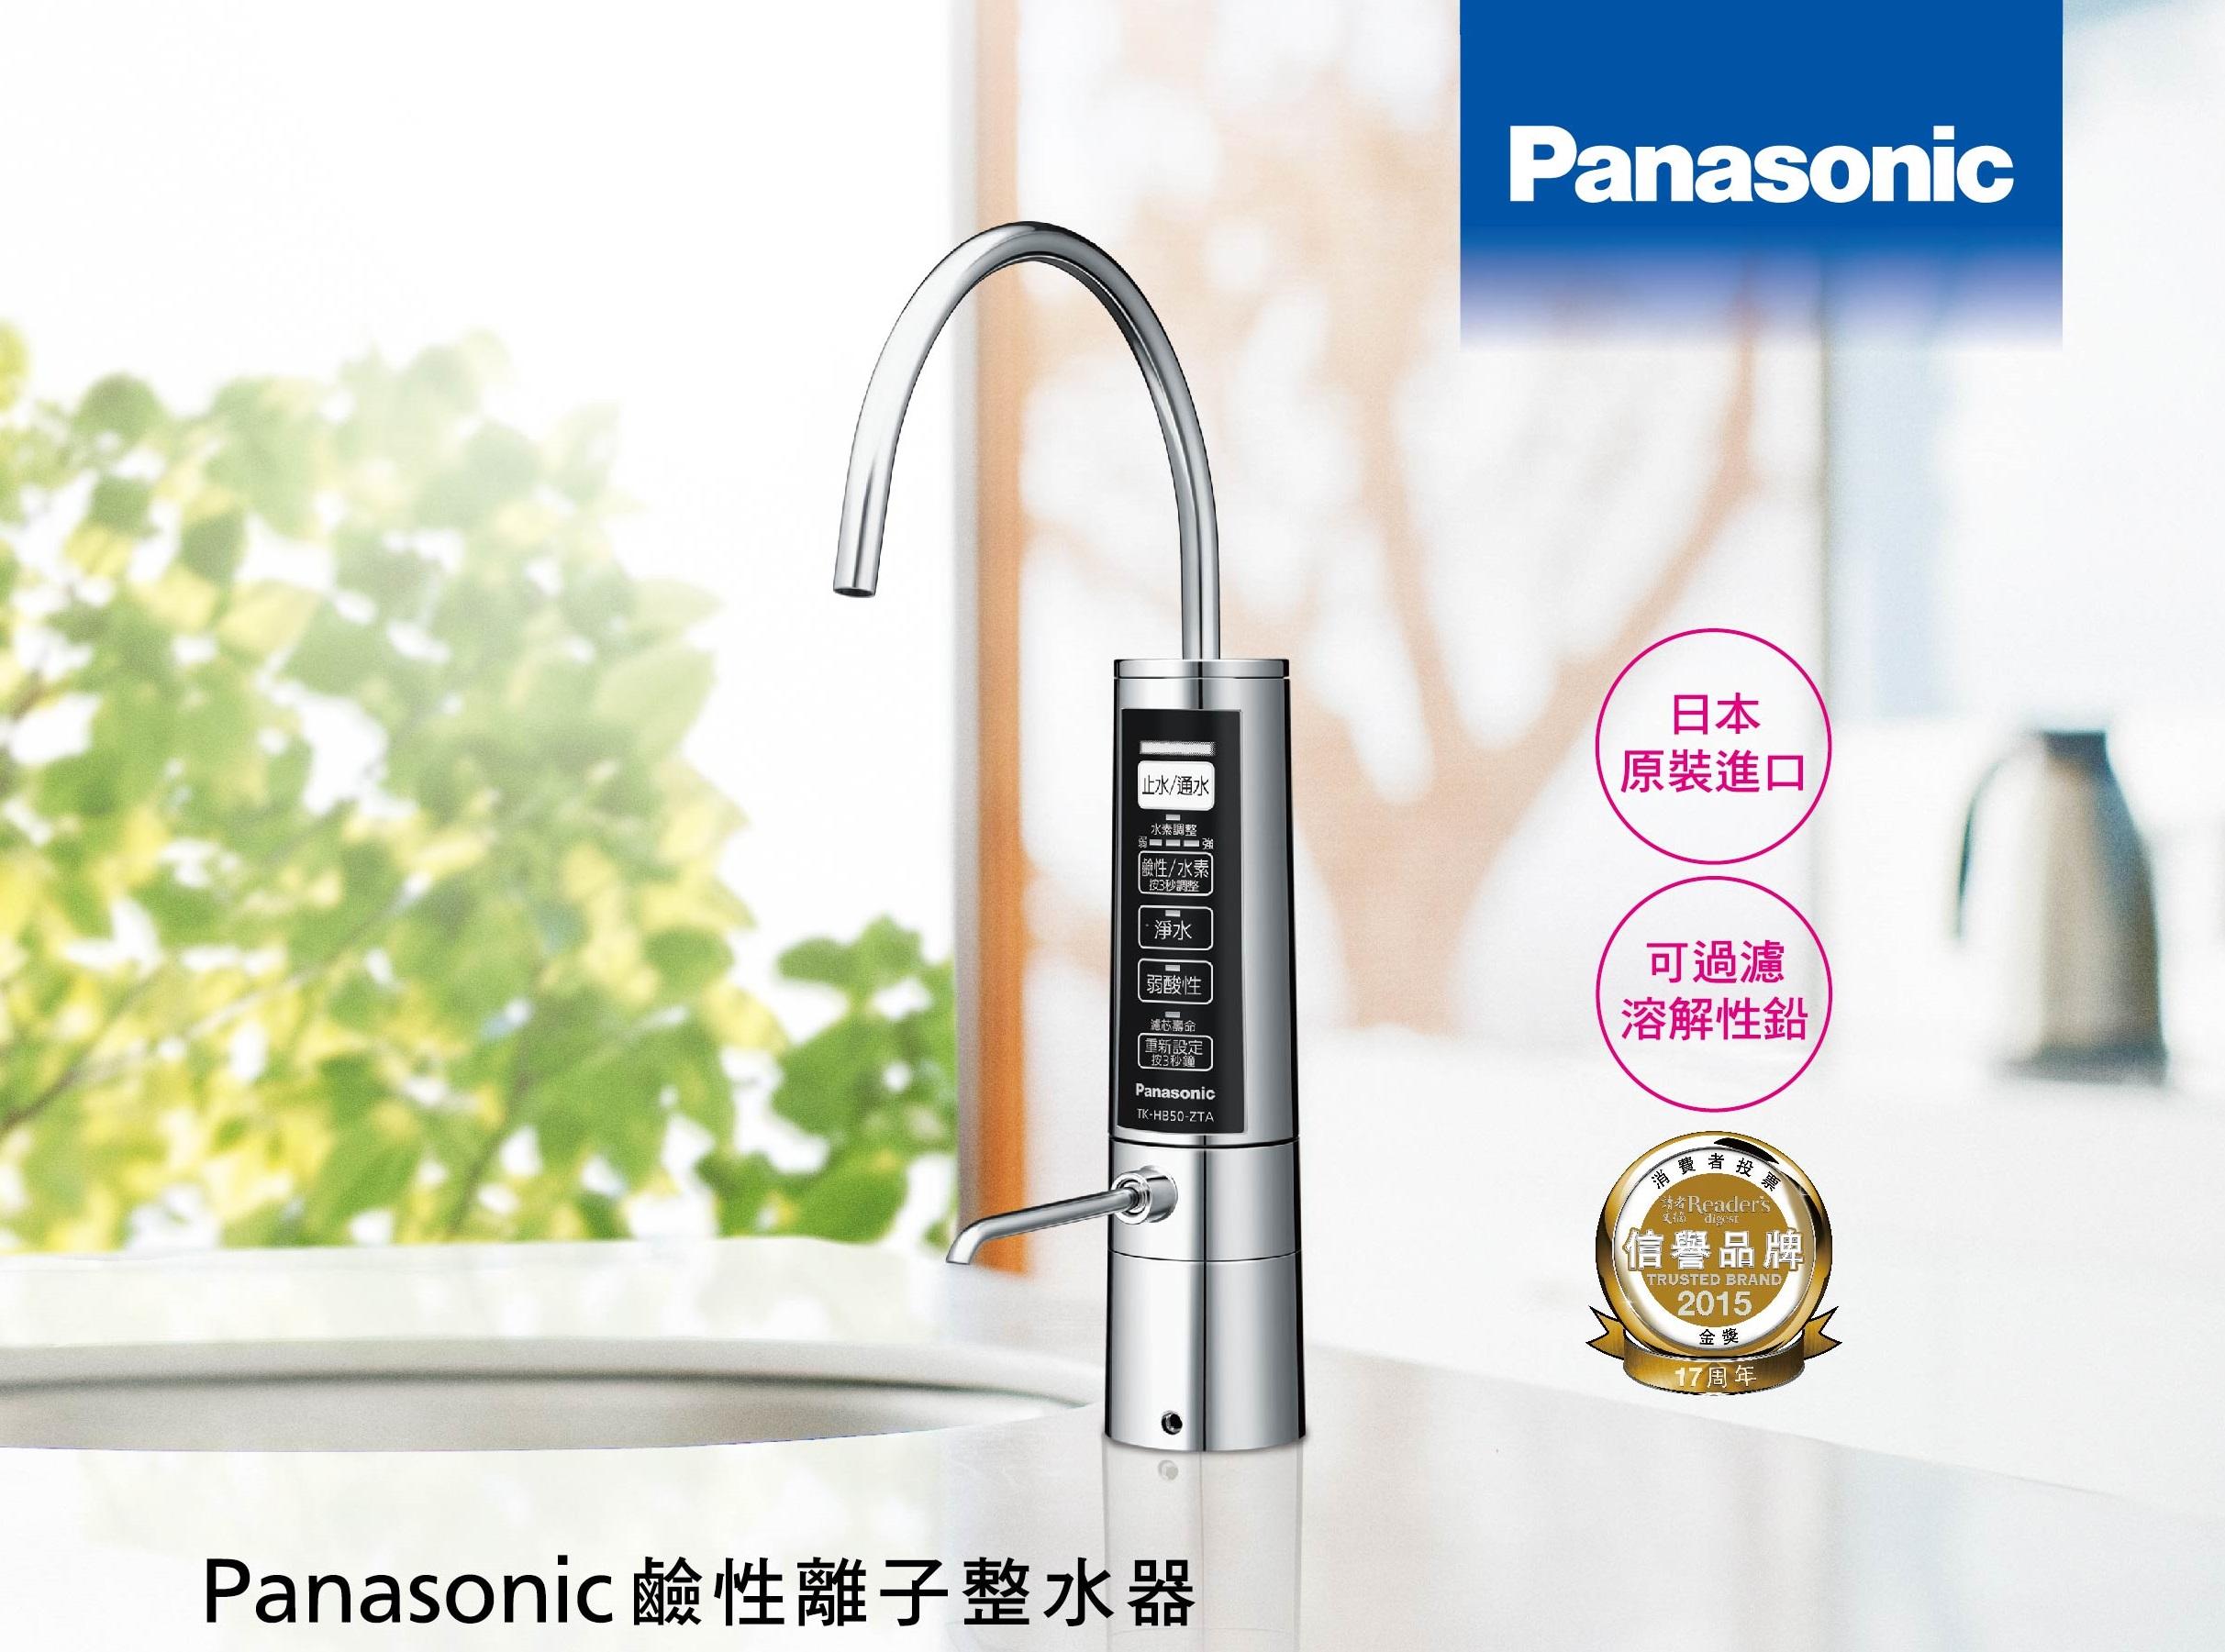 Panasonic 鹼性離子整水器  層層過濾溶解性鉛 讓您安心喝好水